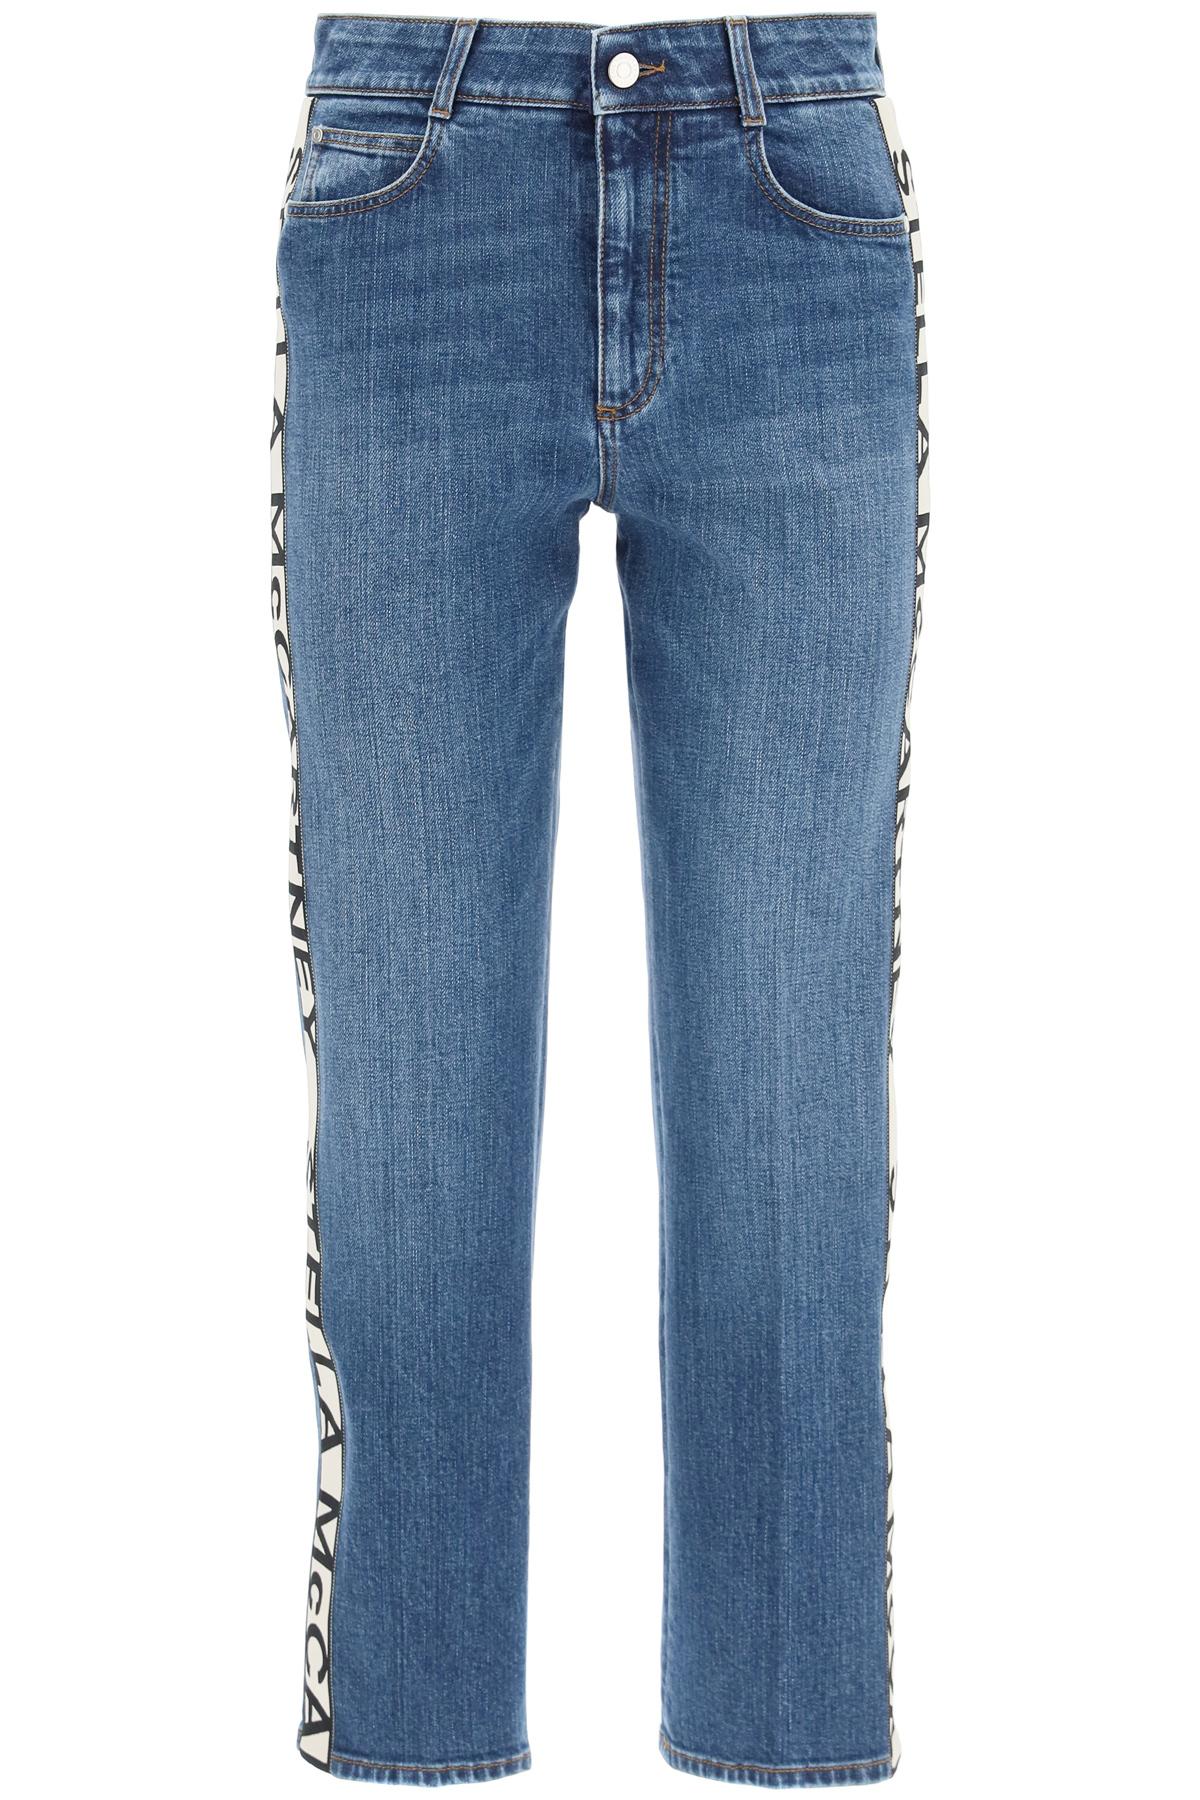 Stella mccartney jeans rise cropped bande monogram